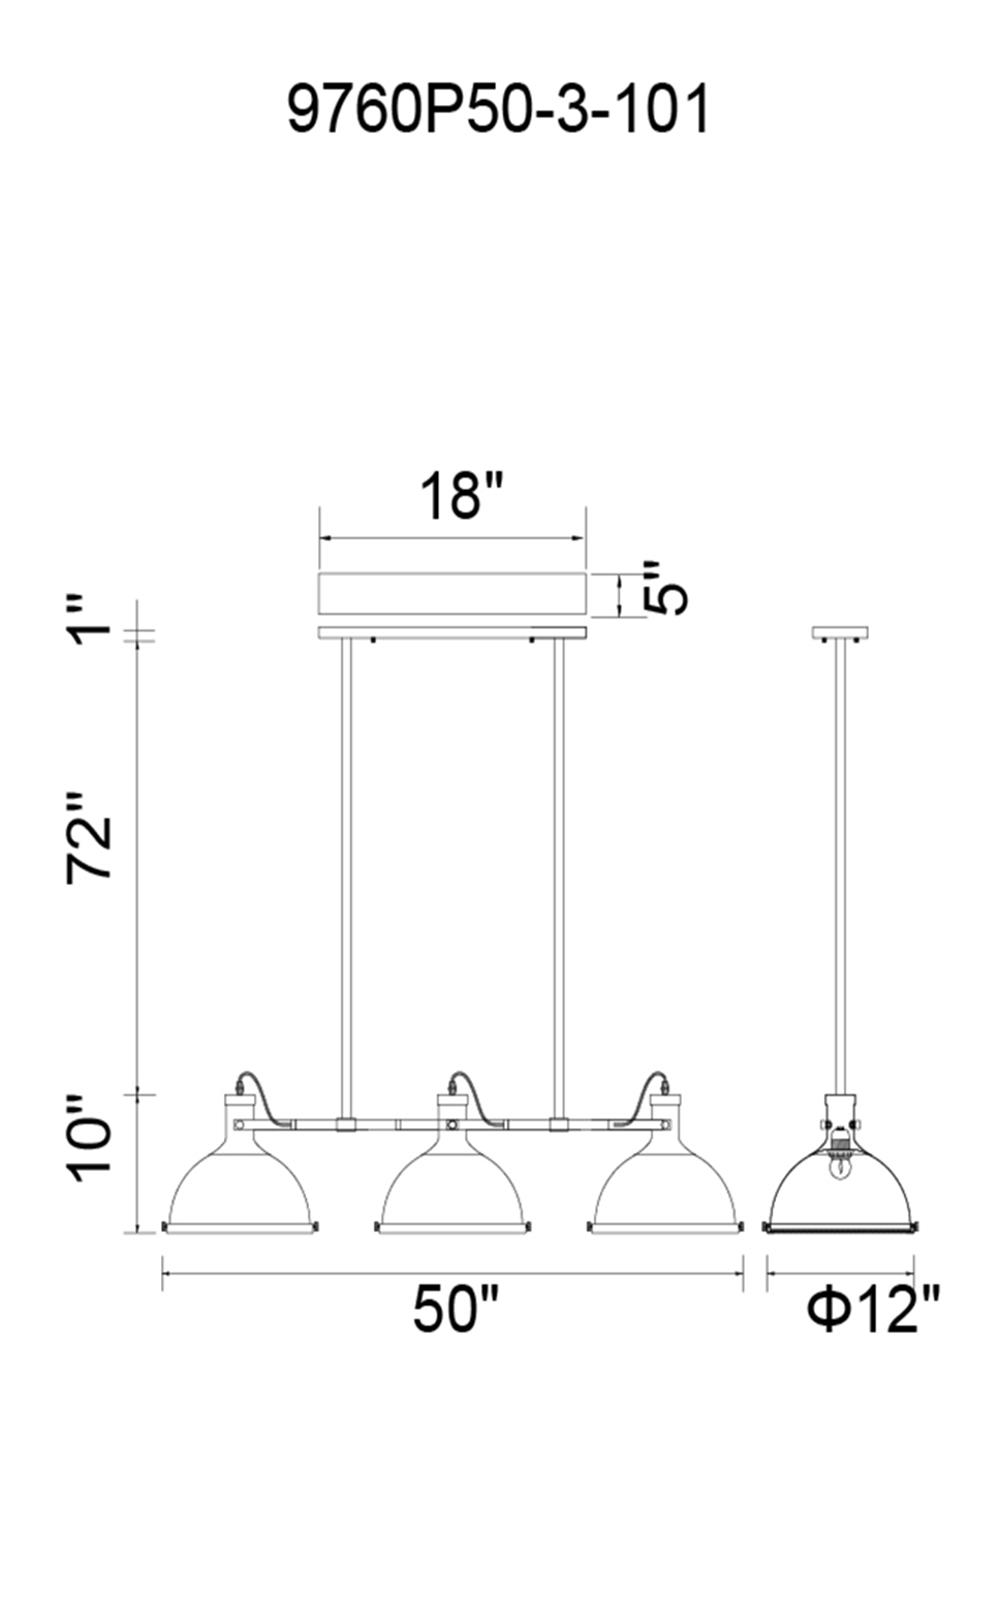 CWI Lighting Strum 3 Light Island Chandelier With Black Finish Model: 9760P50-3-101 Line Drawing